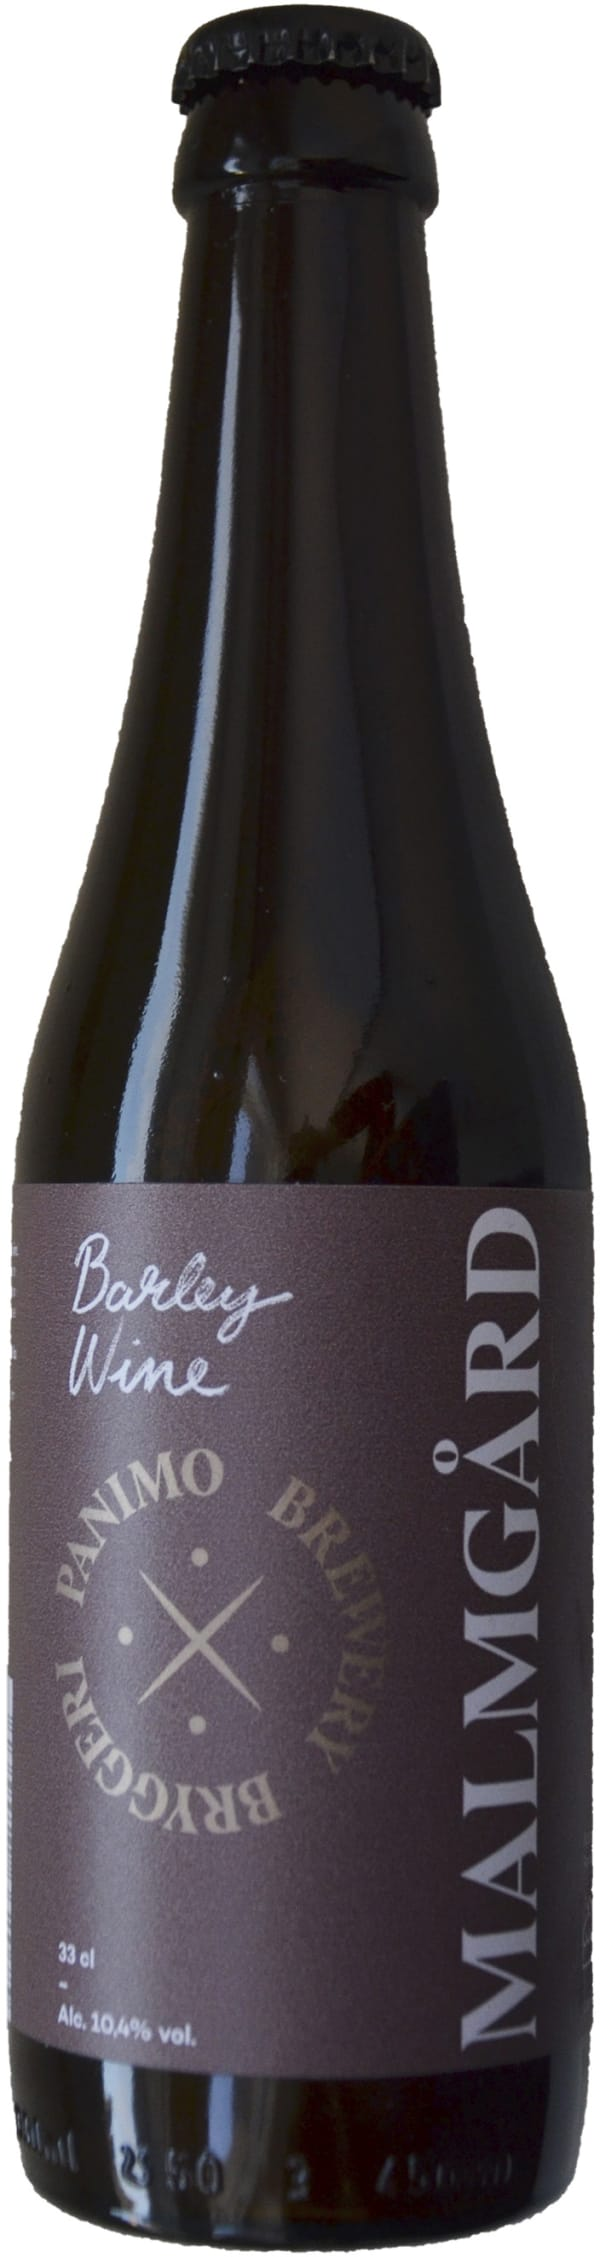 Malmgård Barley Wine 2018